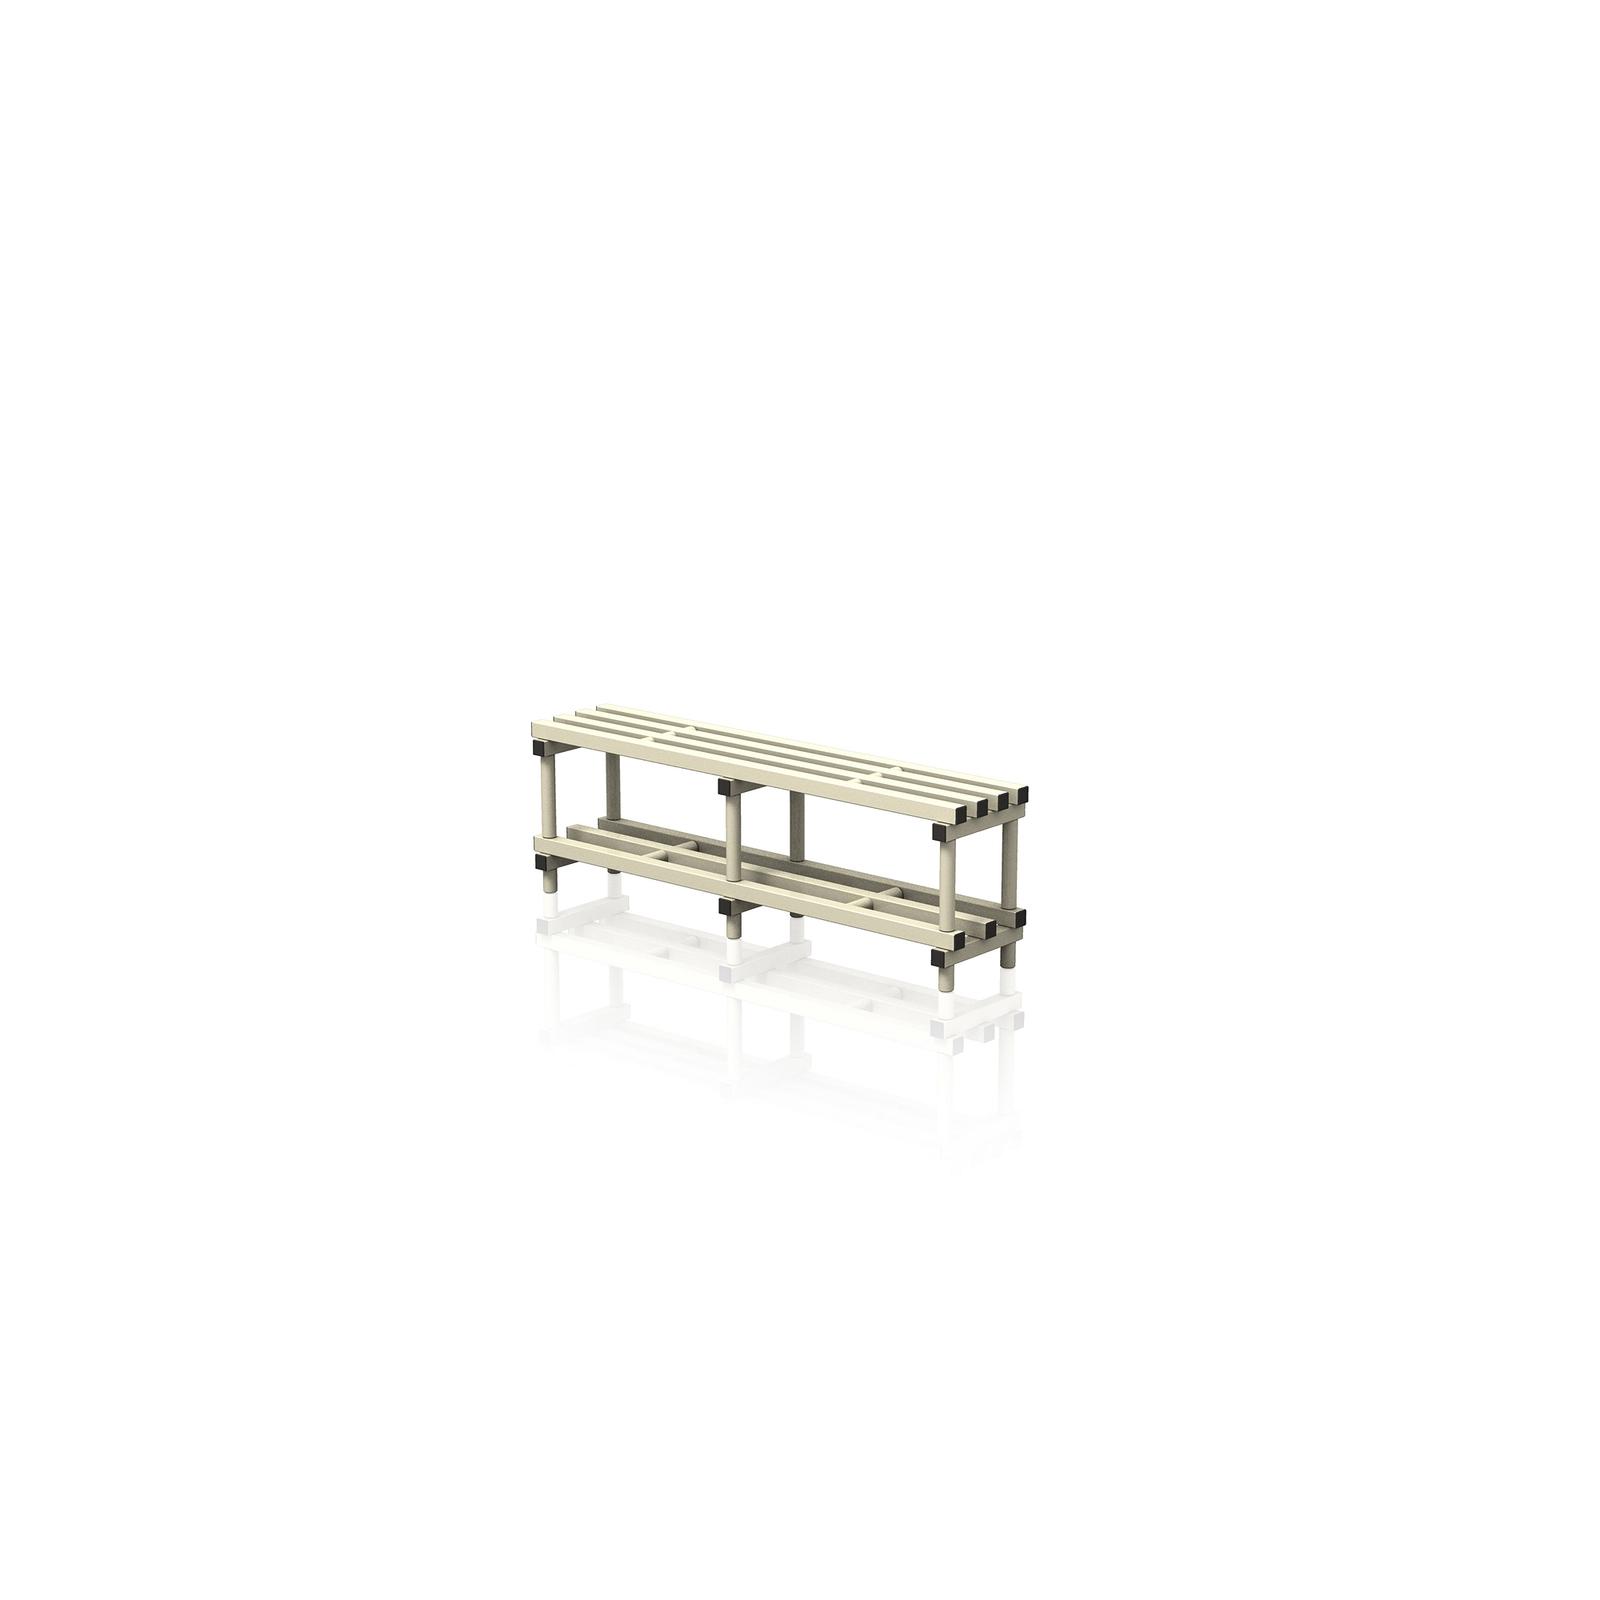 Bench With Bottom Shelf Medium Cream